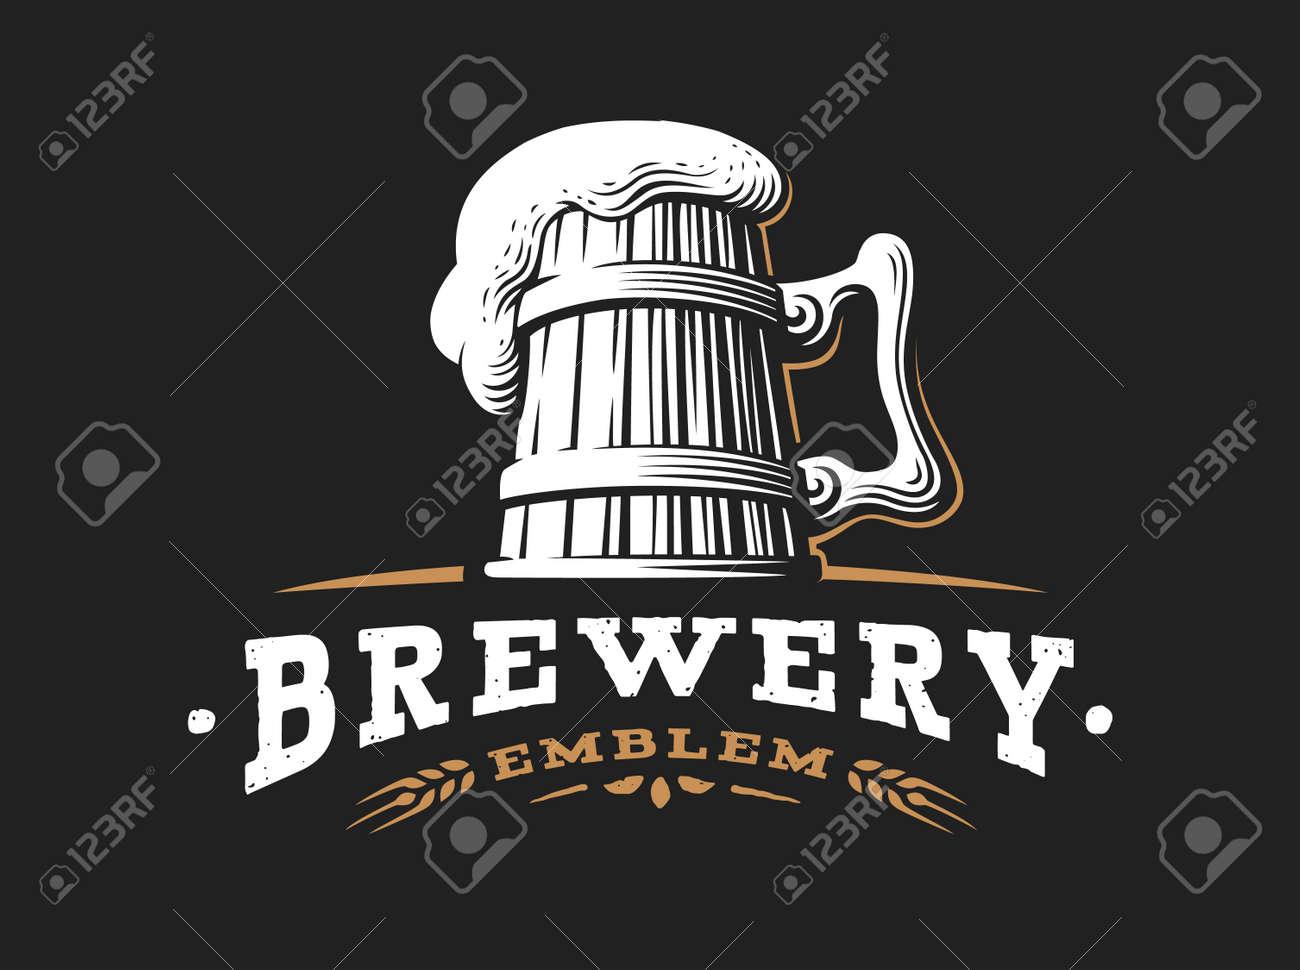 Wooden Beer Mug Logo Vector Illustration Emblem Brewery Design Royalty Free Cliparts Vectors And Stock Illustration Image 70777685